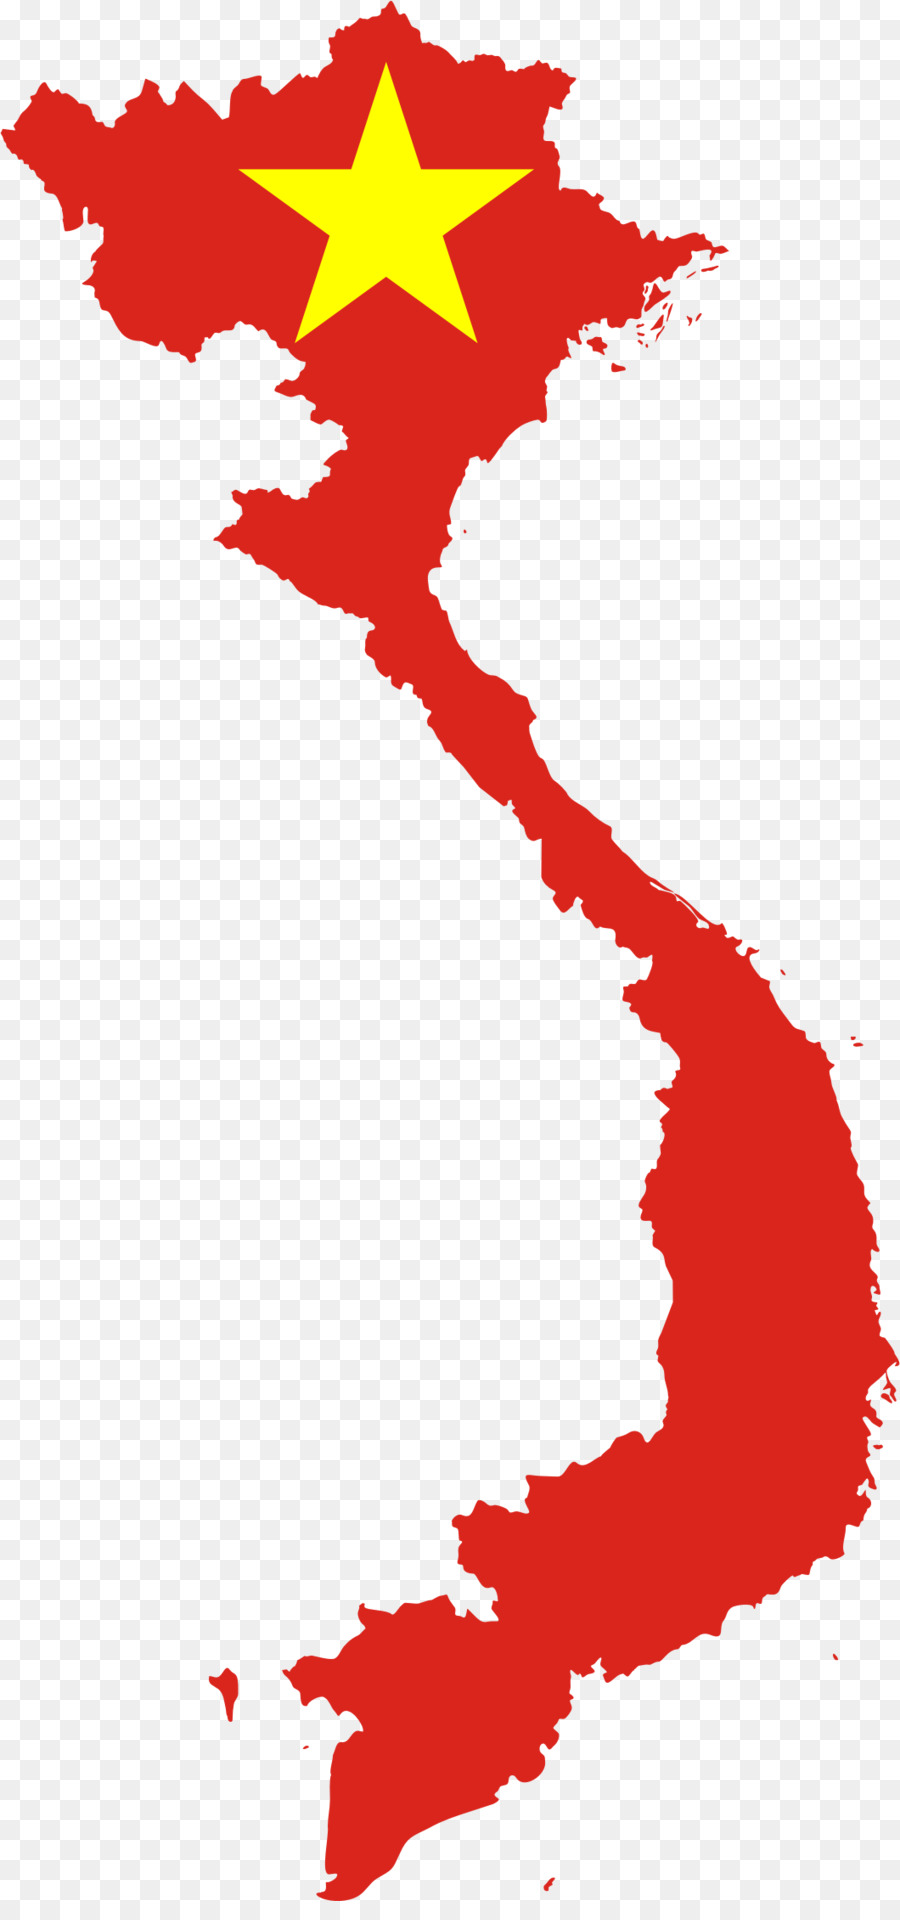 War in vietnam clipart banner download Red Tree png download - 1060*2239 - Free Transparent Vietnam ... banner download